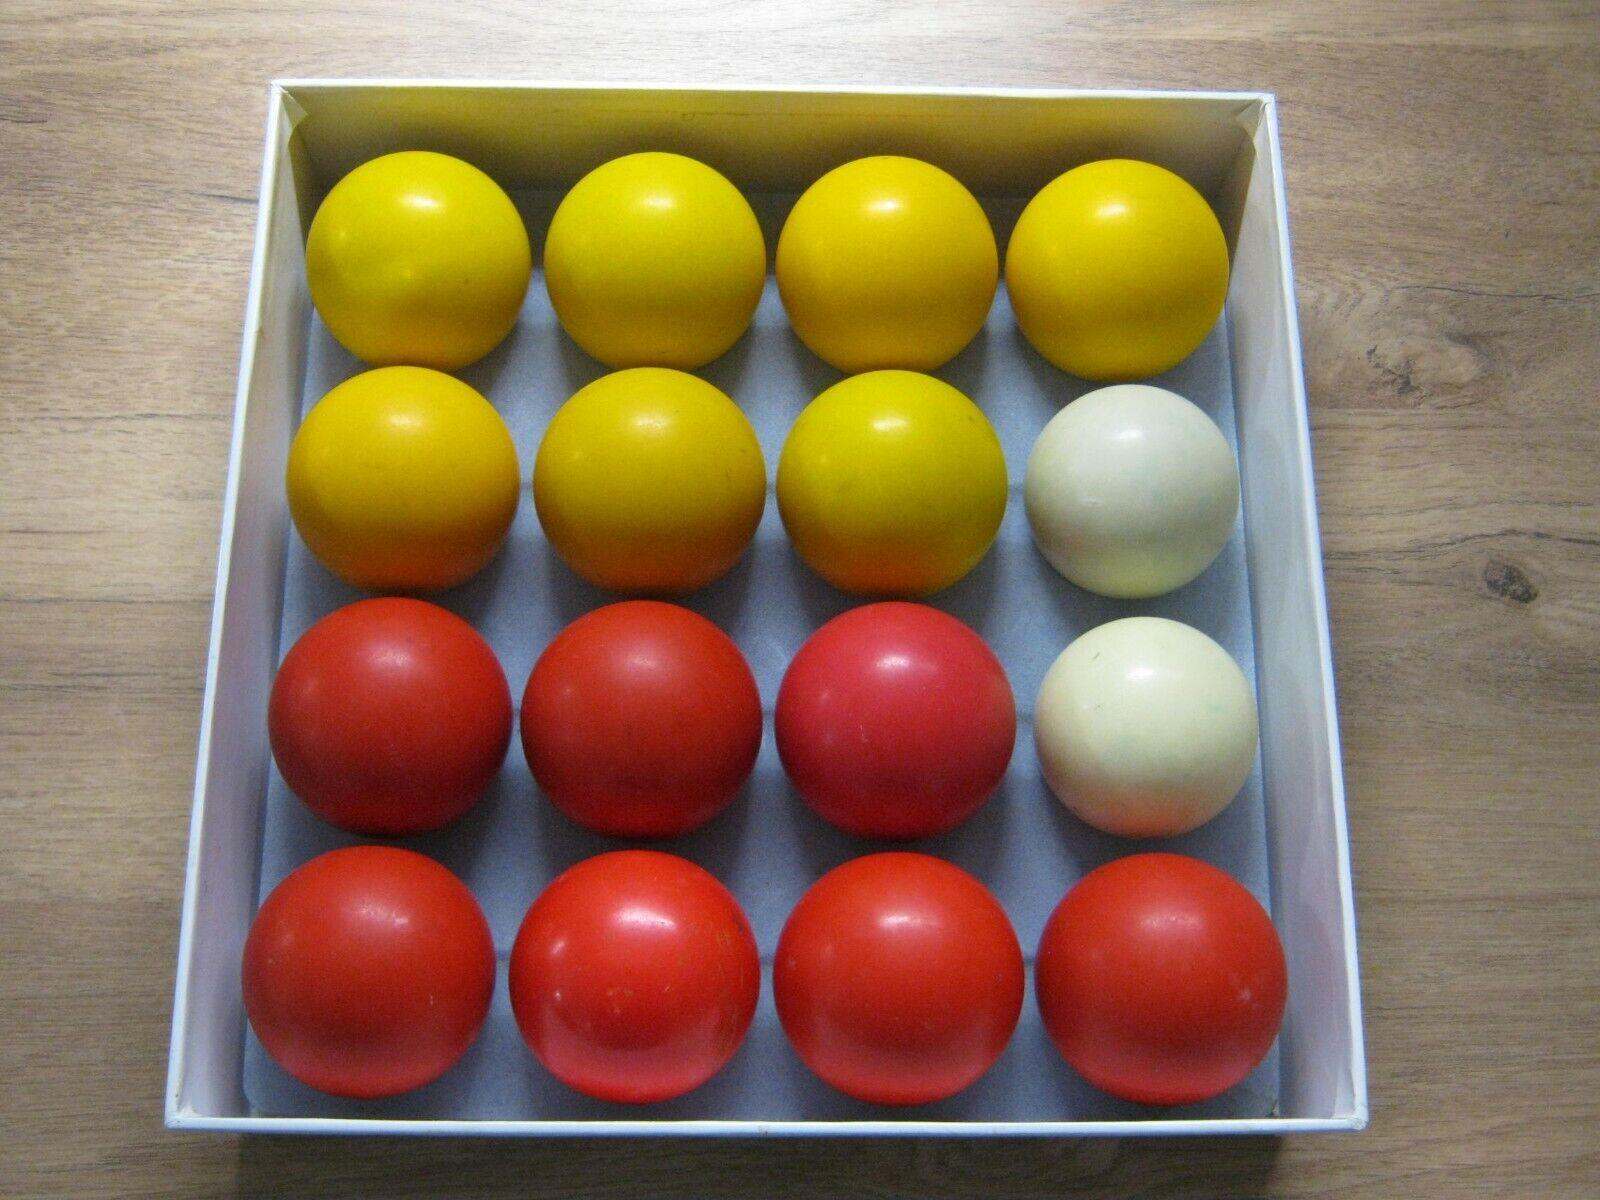 PROFESSIONAL POOL BALLS - NO BLACK BALL - 2 INCH DIAMETER POOL TABLE BALLS